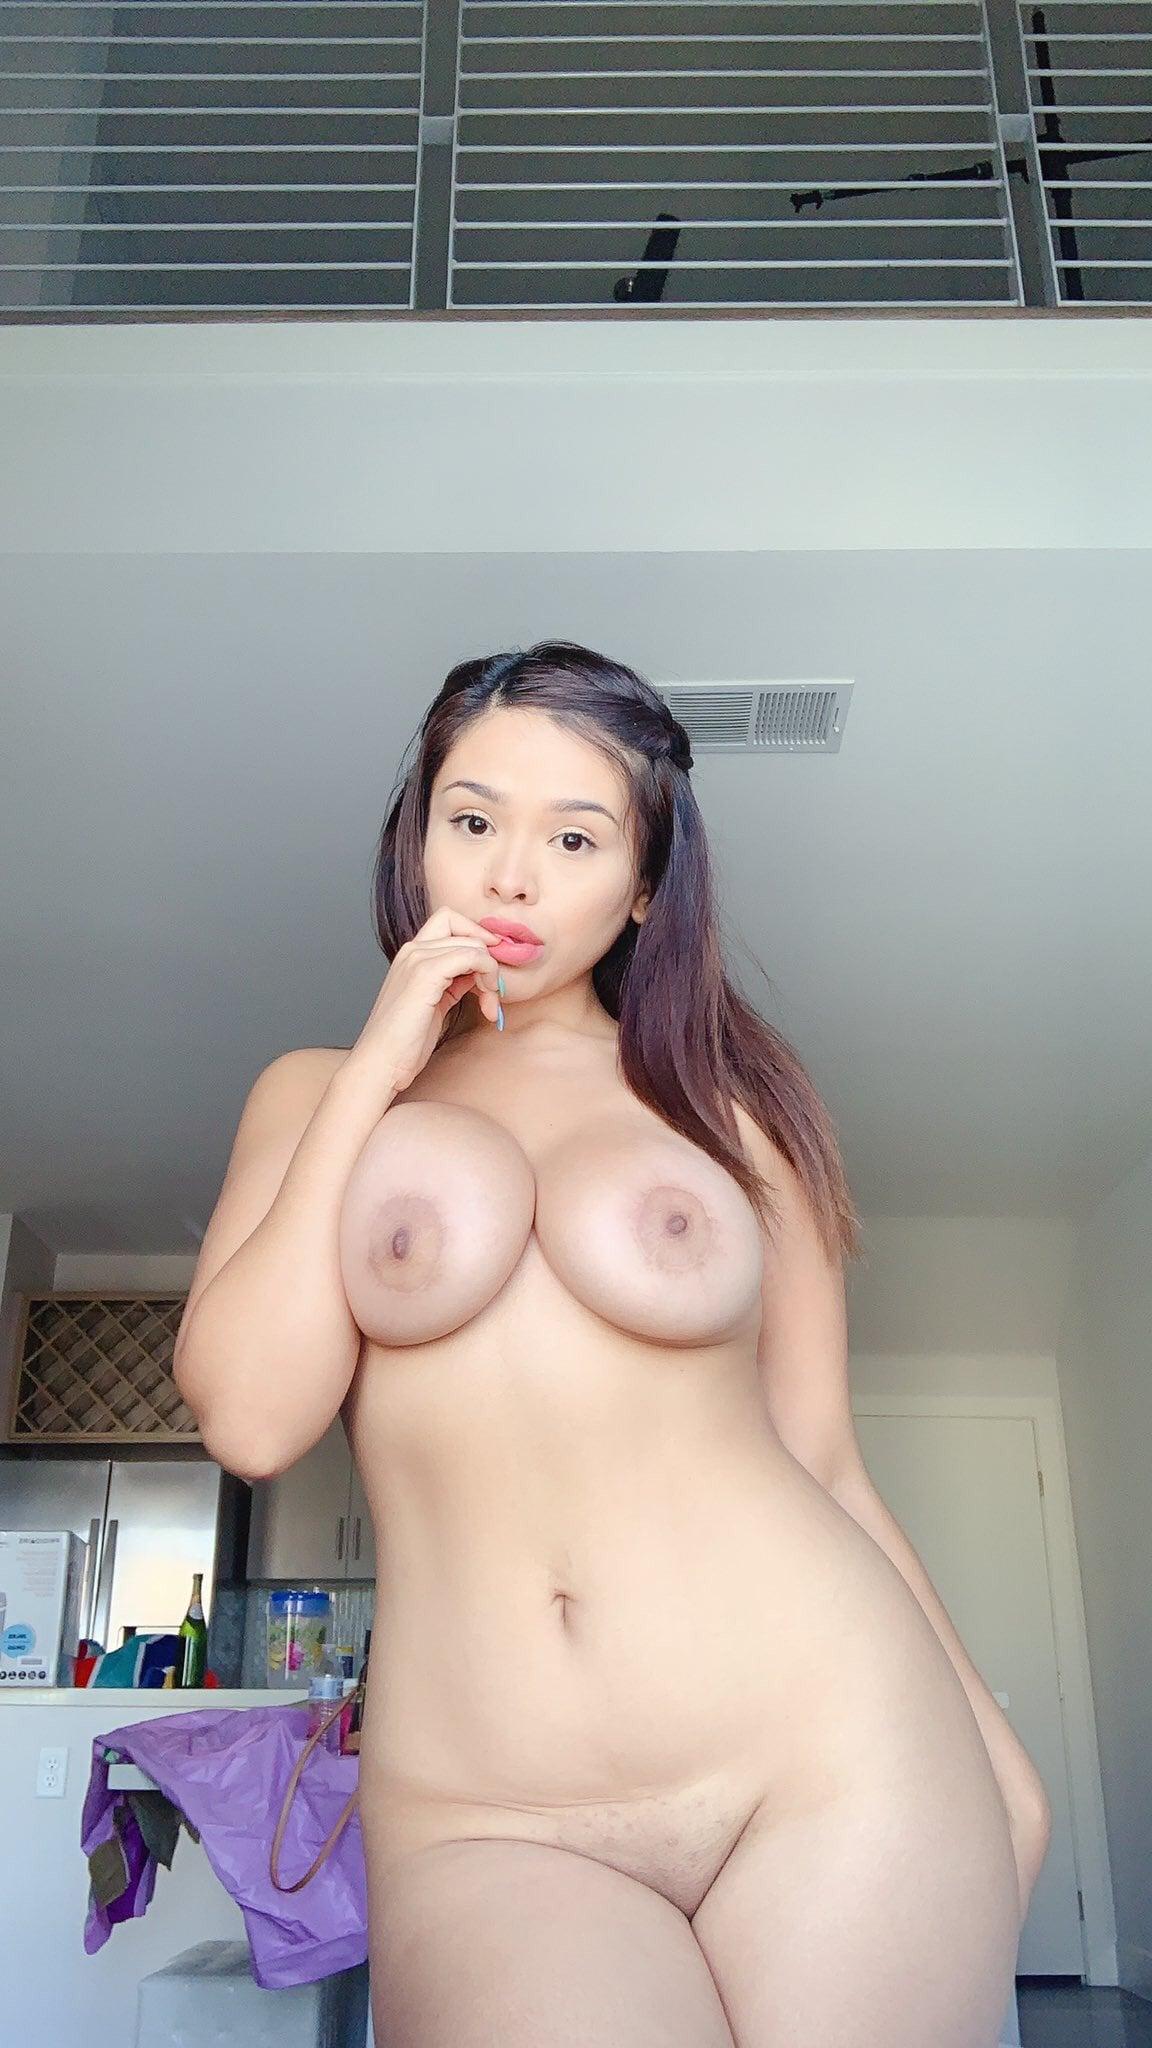 Alvajay Reddit Nude photo 7